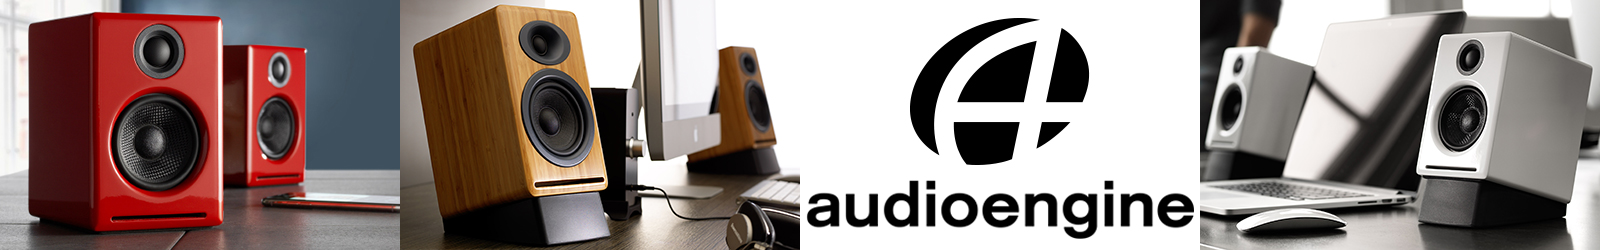 Audioengine Banner